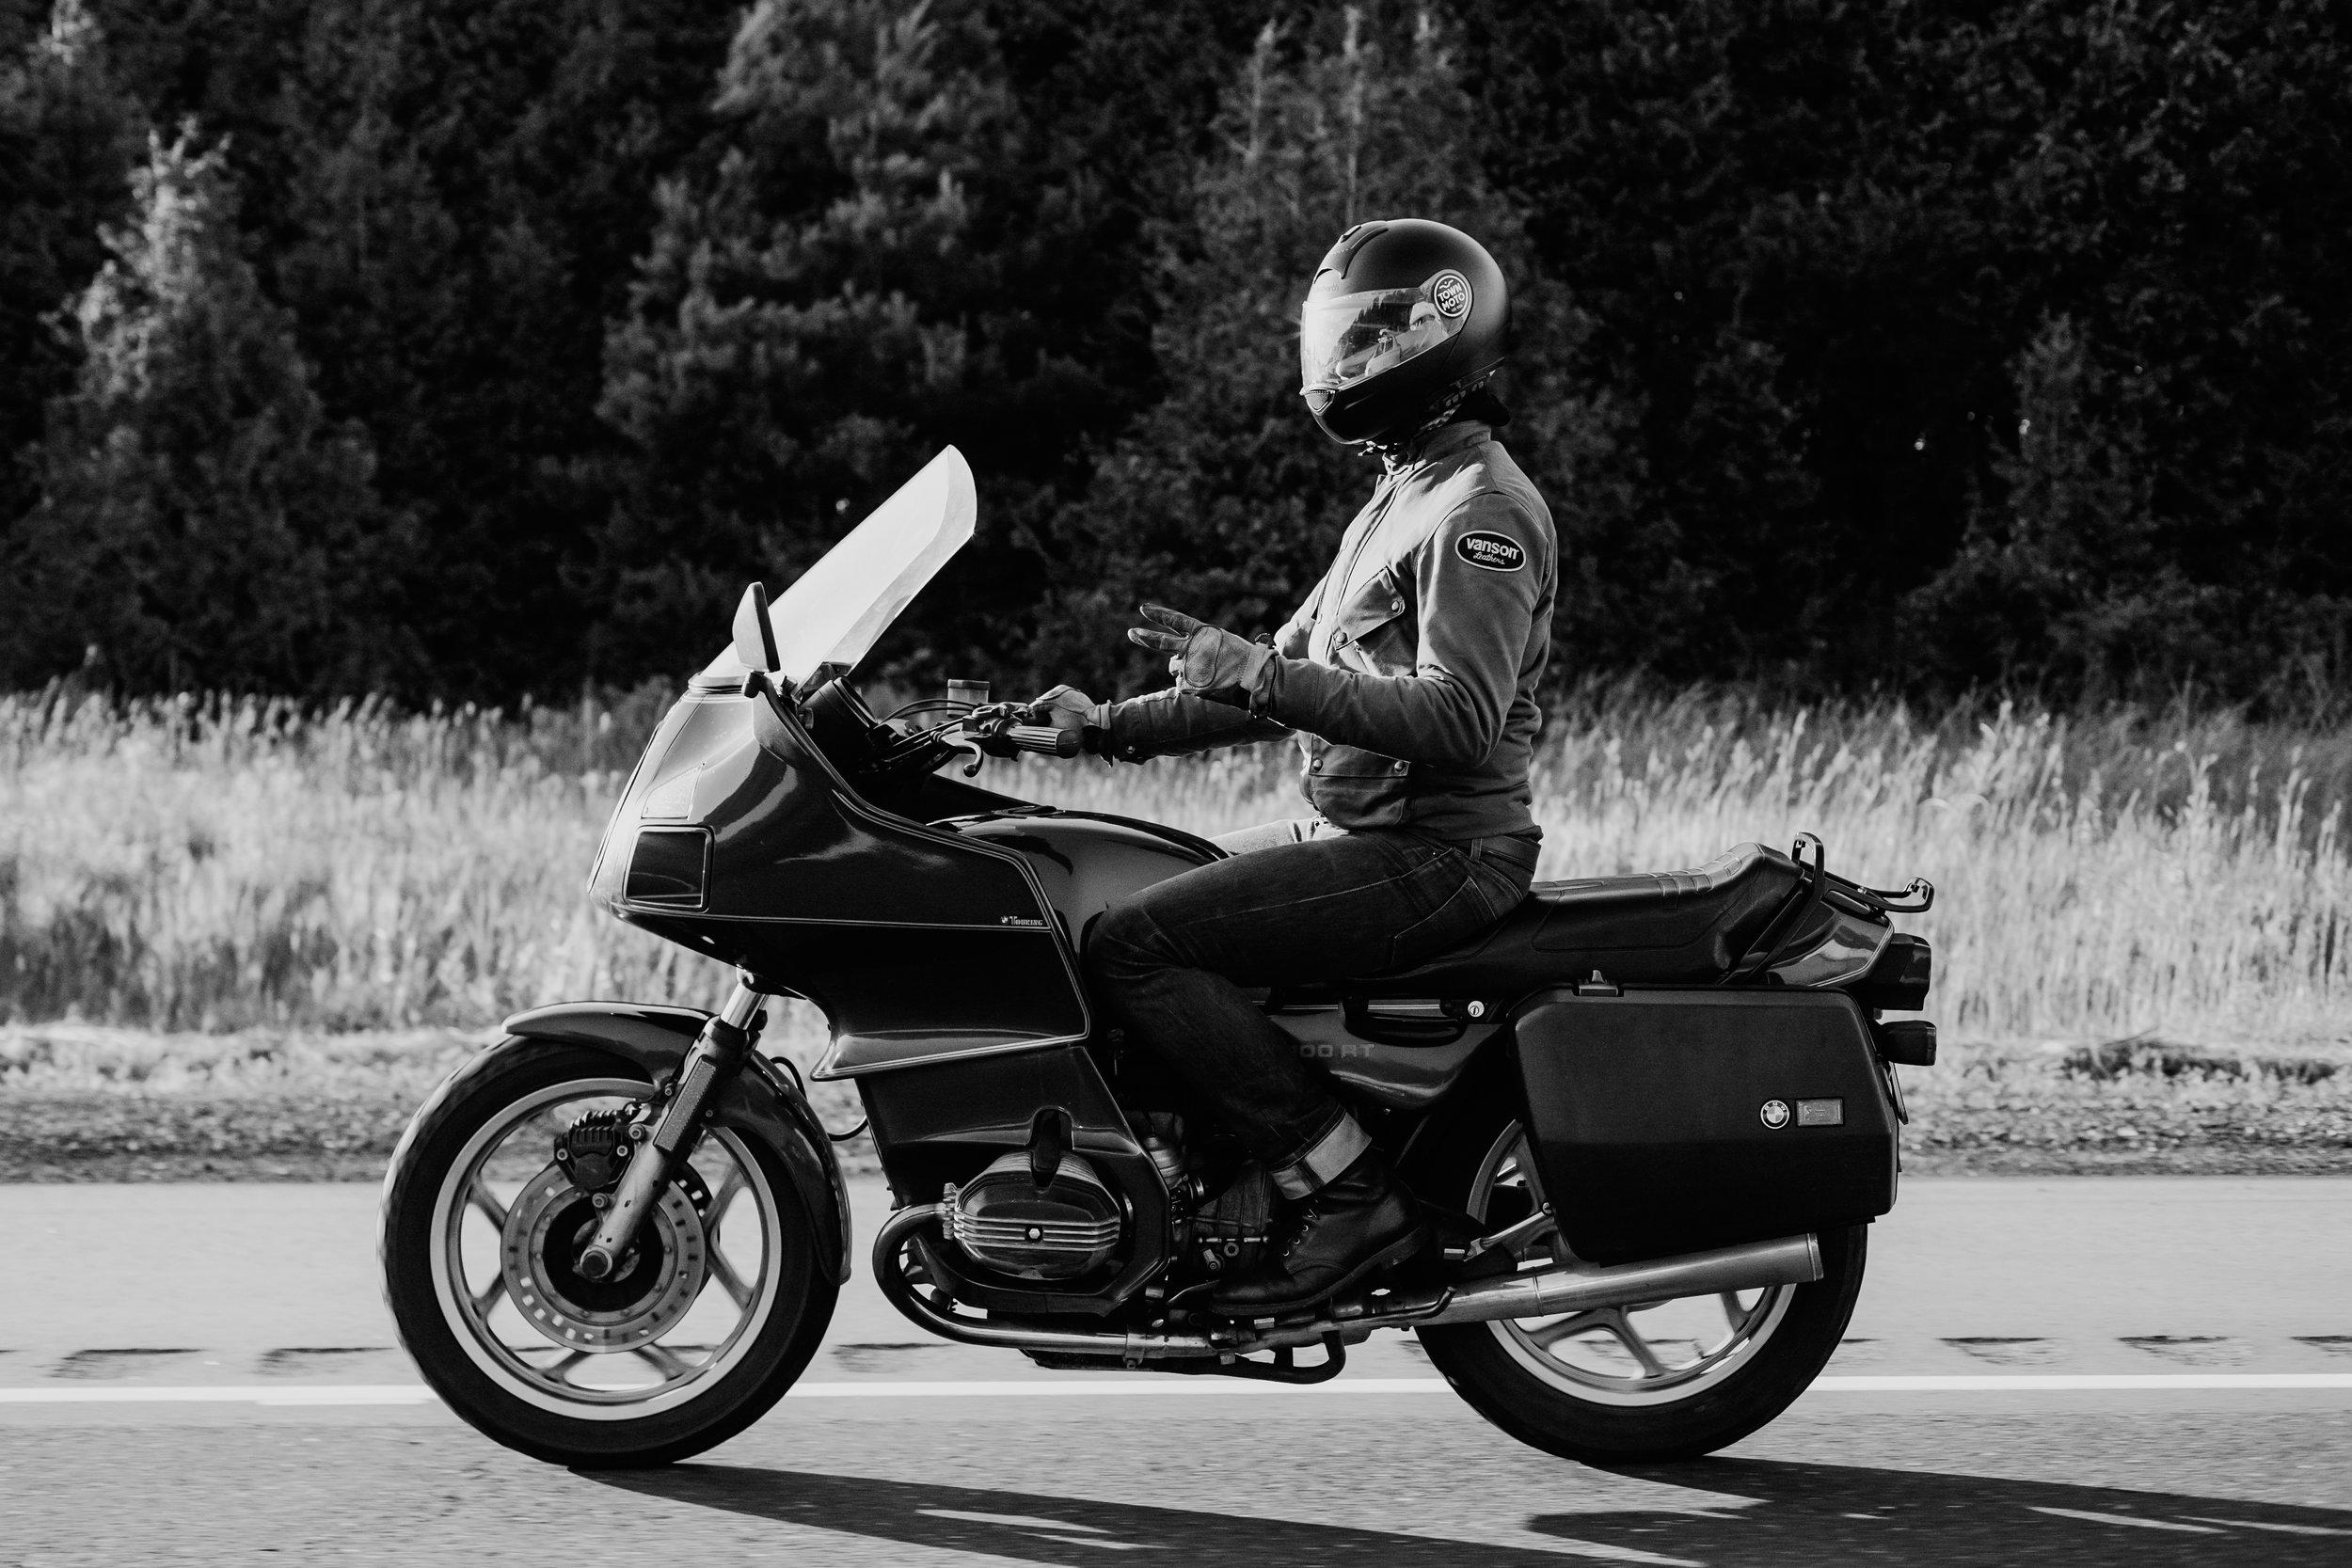 Viktor's Ride | 1992 BMW R100RT | TheMotoSocial